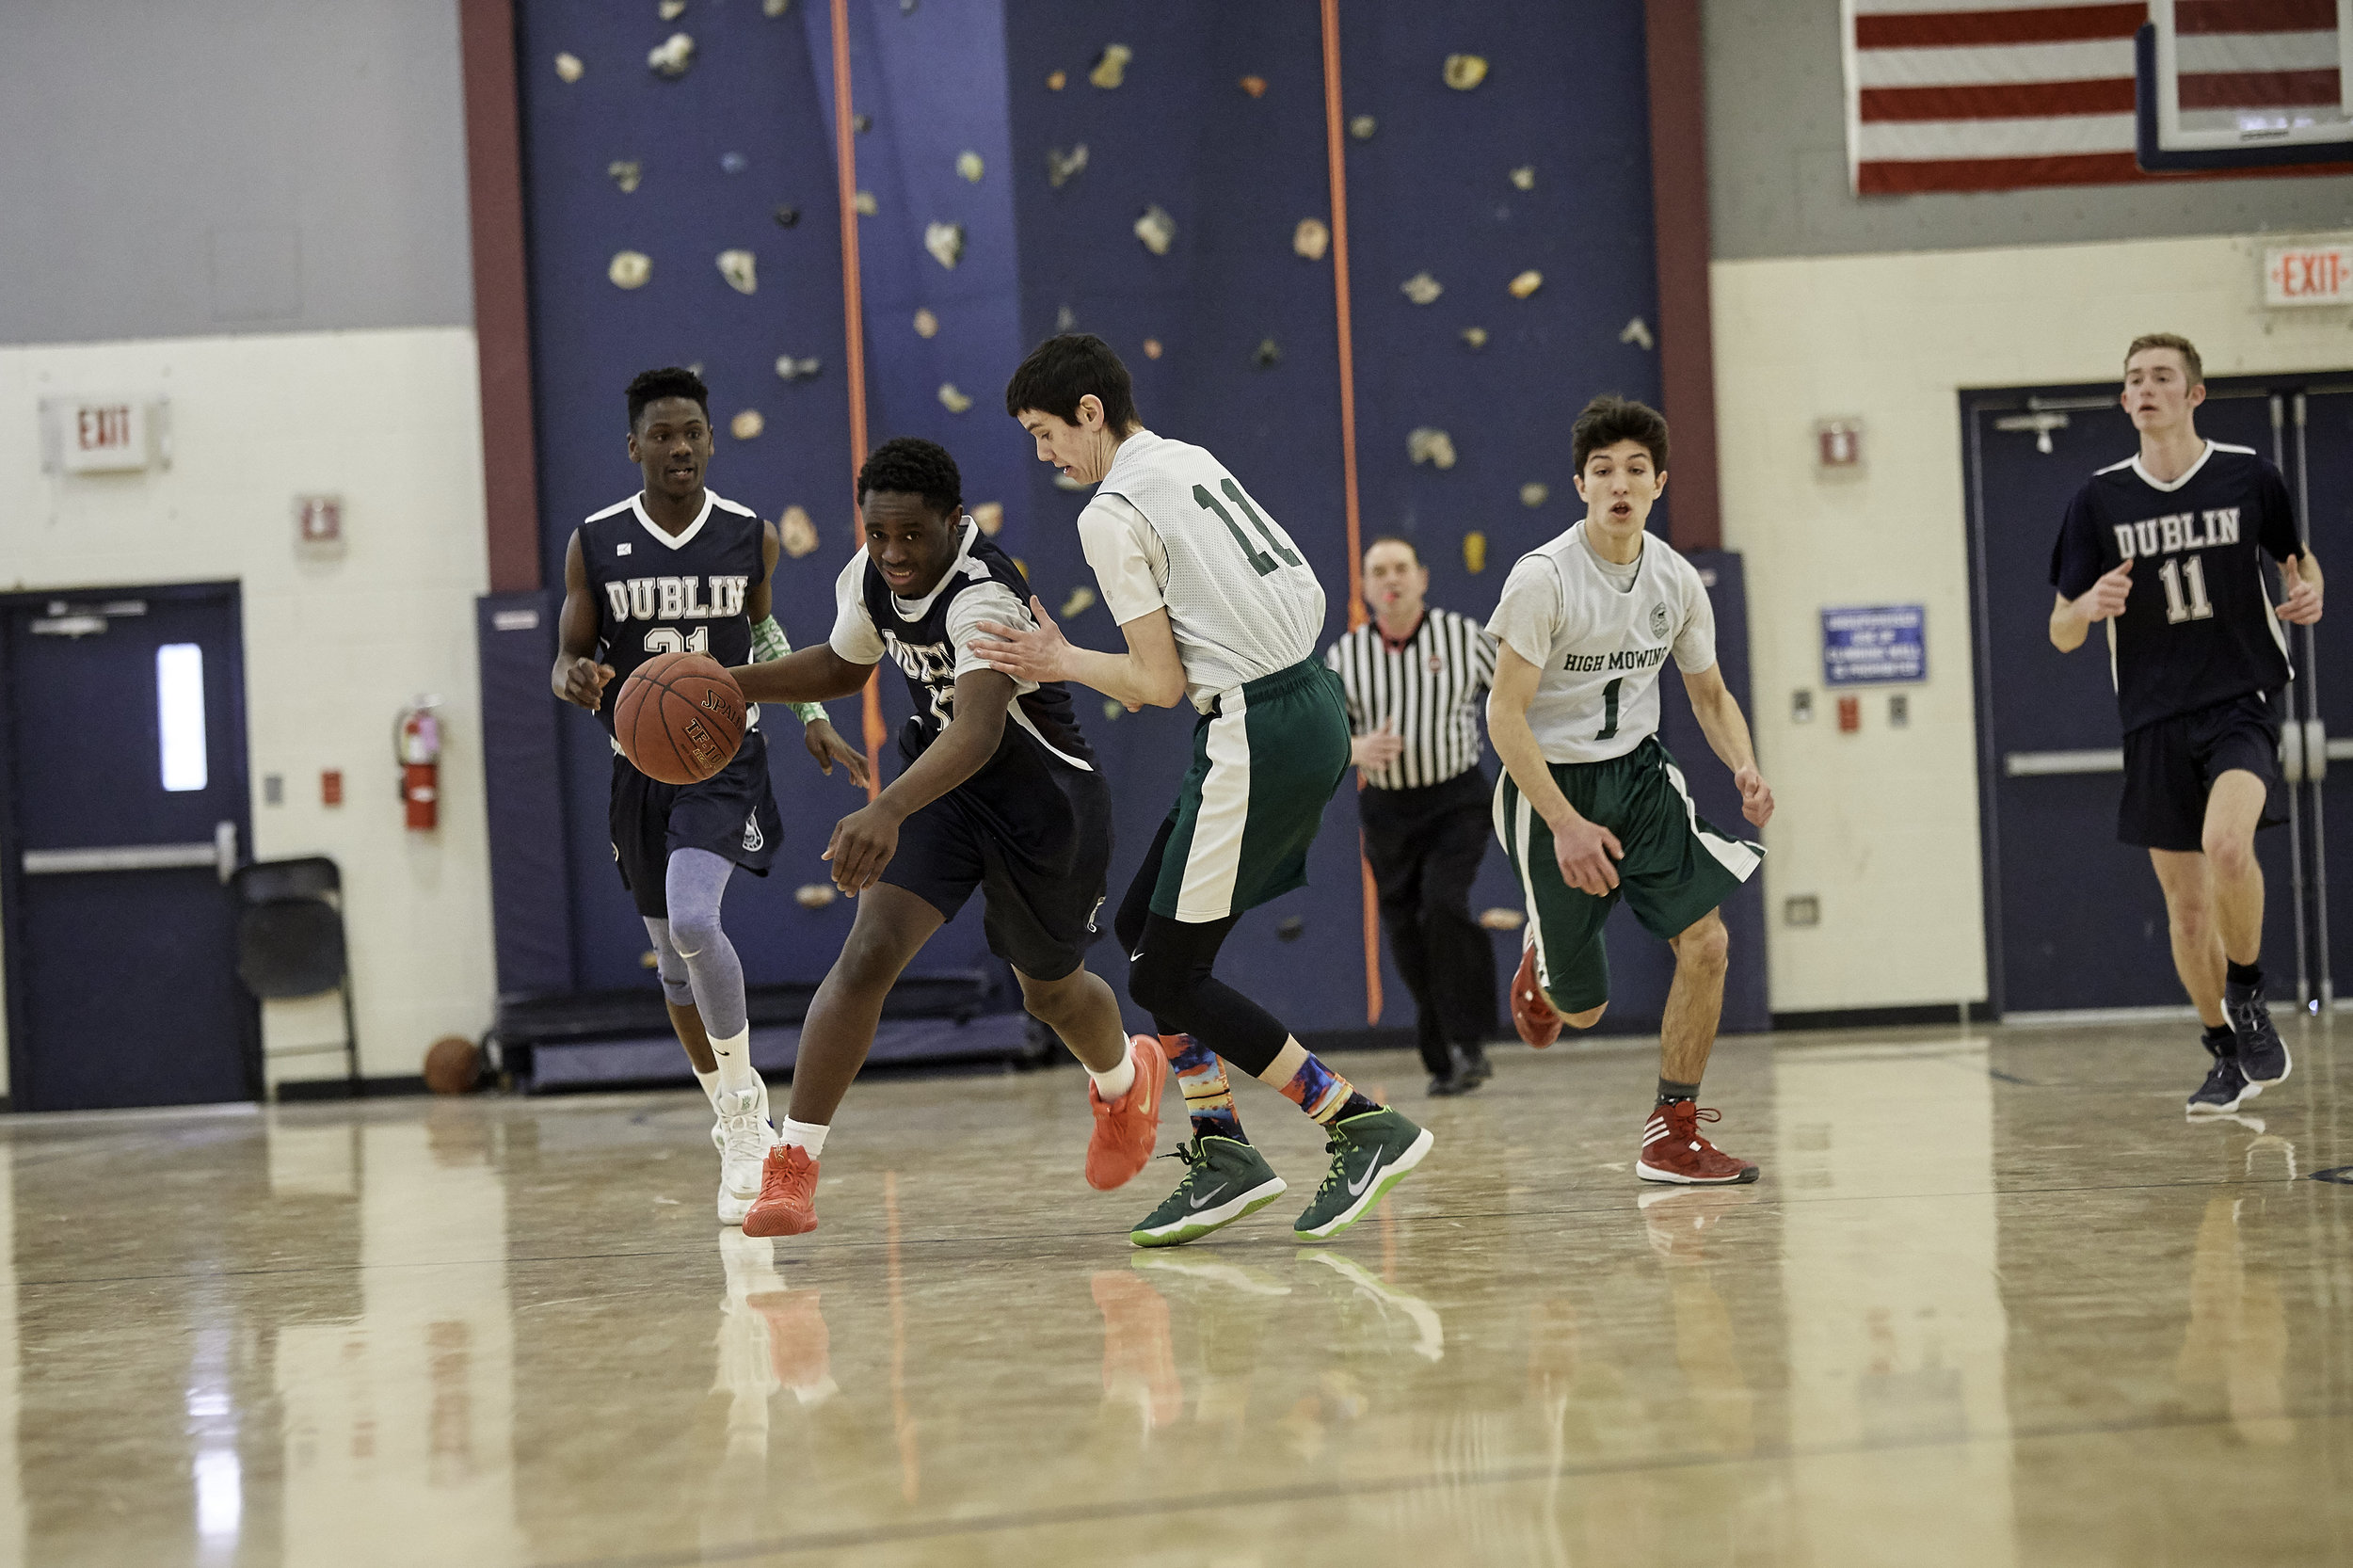 Boys Varsity Basketball vs High Mowing School - Feb 02 2019 - 0017.jpg